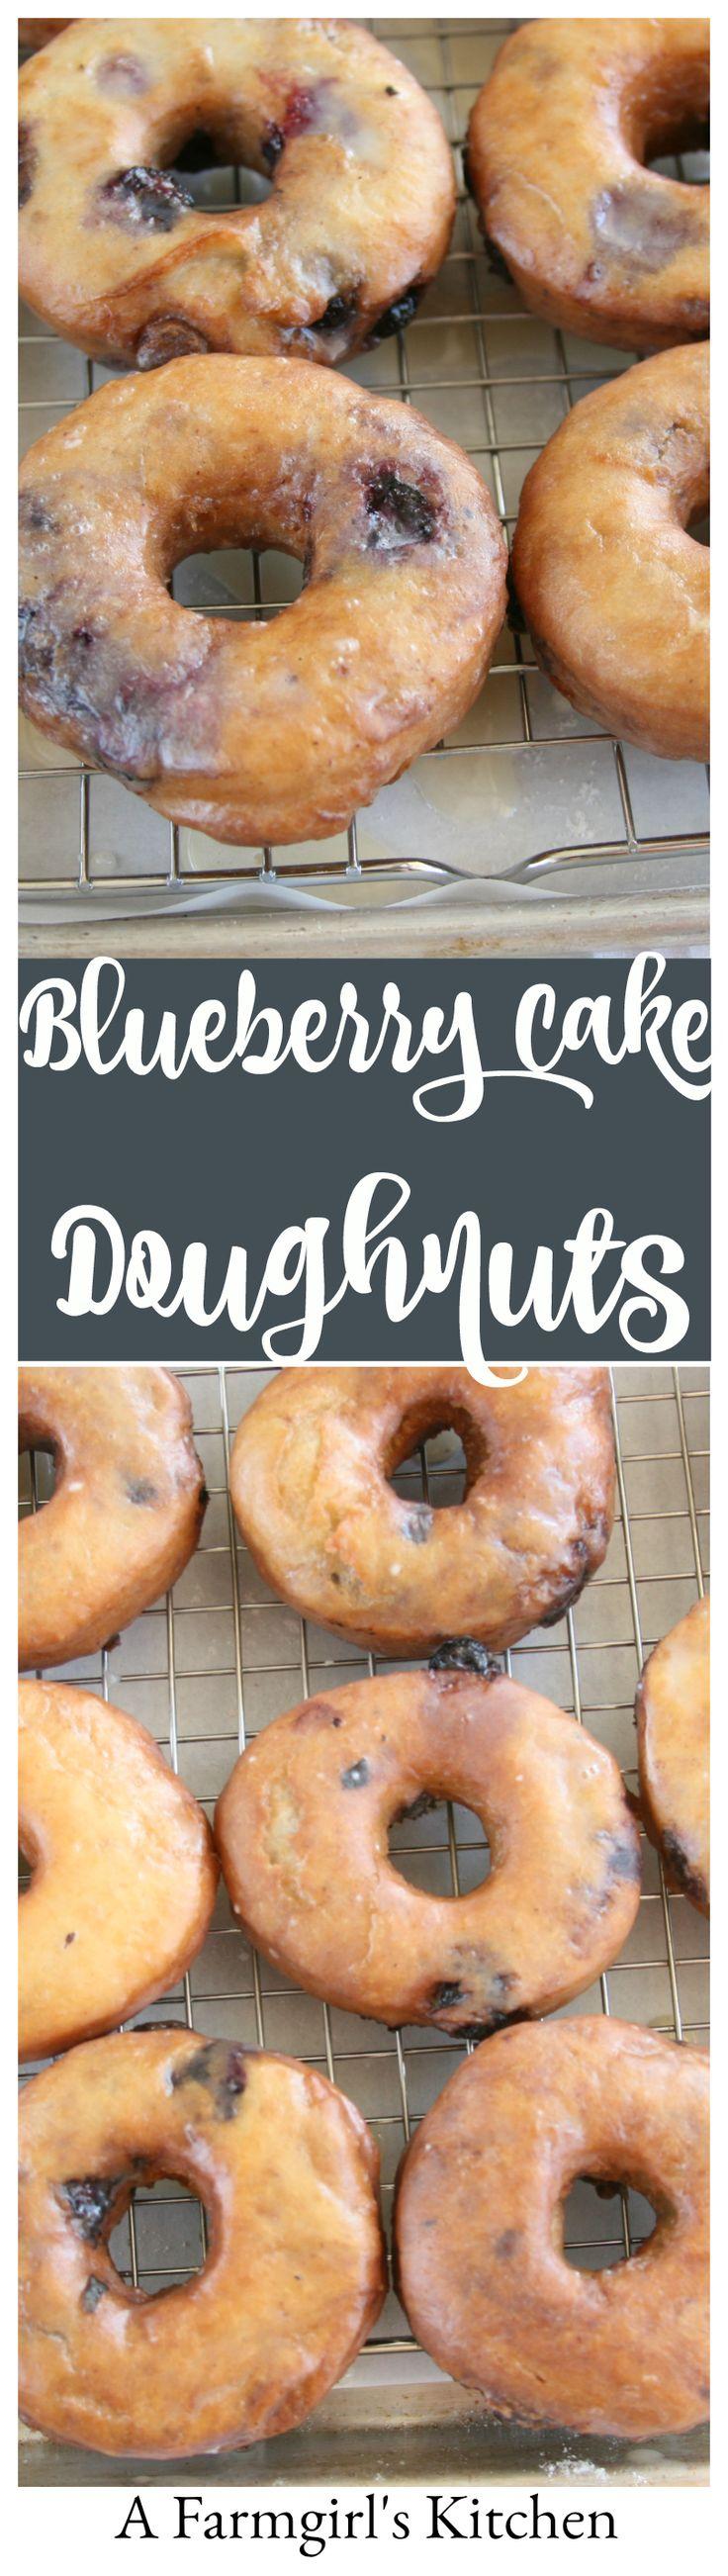 Blueberry Cake Doughnuts #recipe #homemade #foodblogger http://afarmgirlskitchen.com/blueberry-cake-doughnuts/